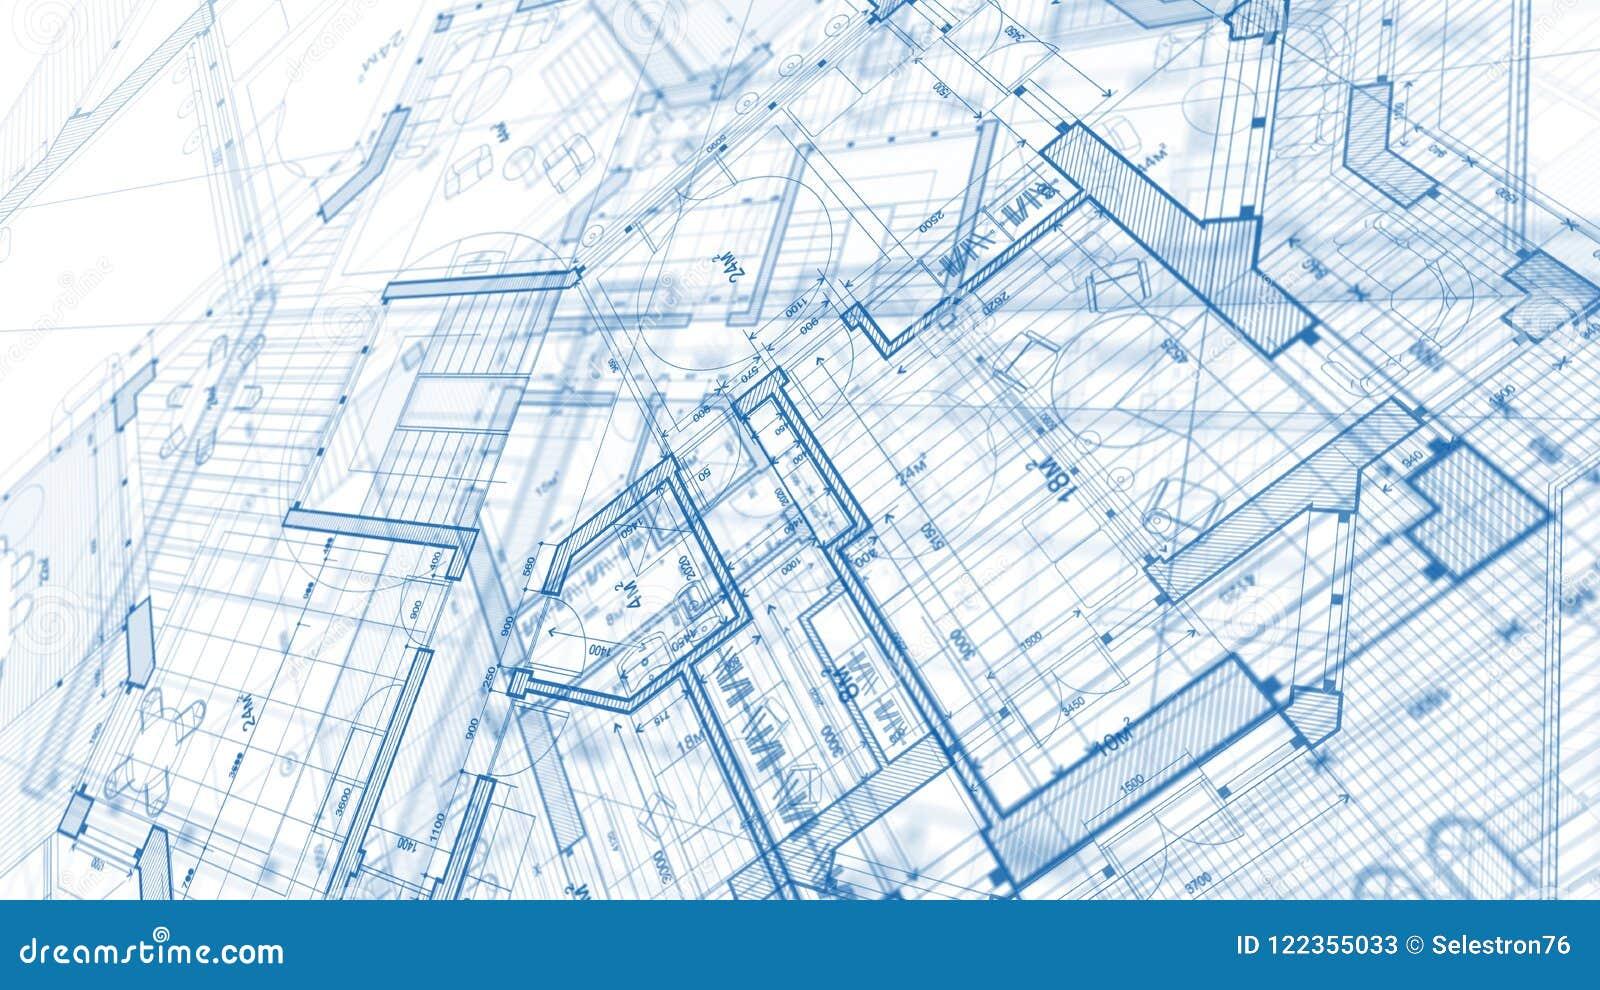 Дизайн архитектуры: план светокопии - иллюстрация mod плана